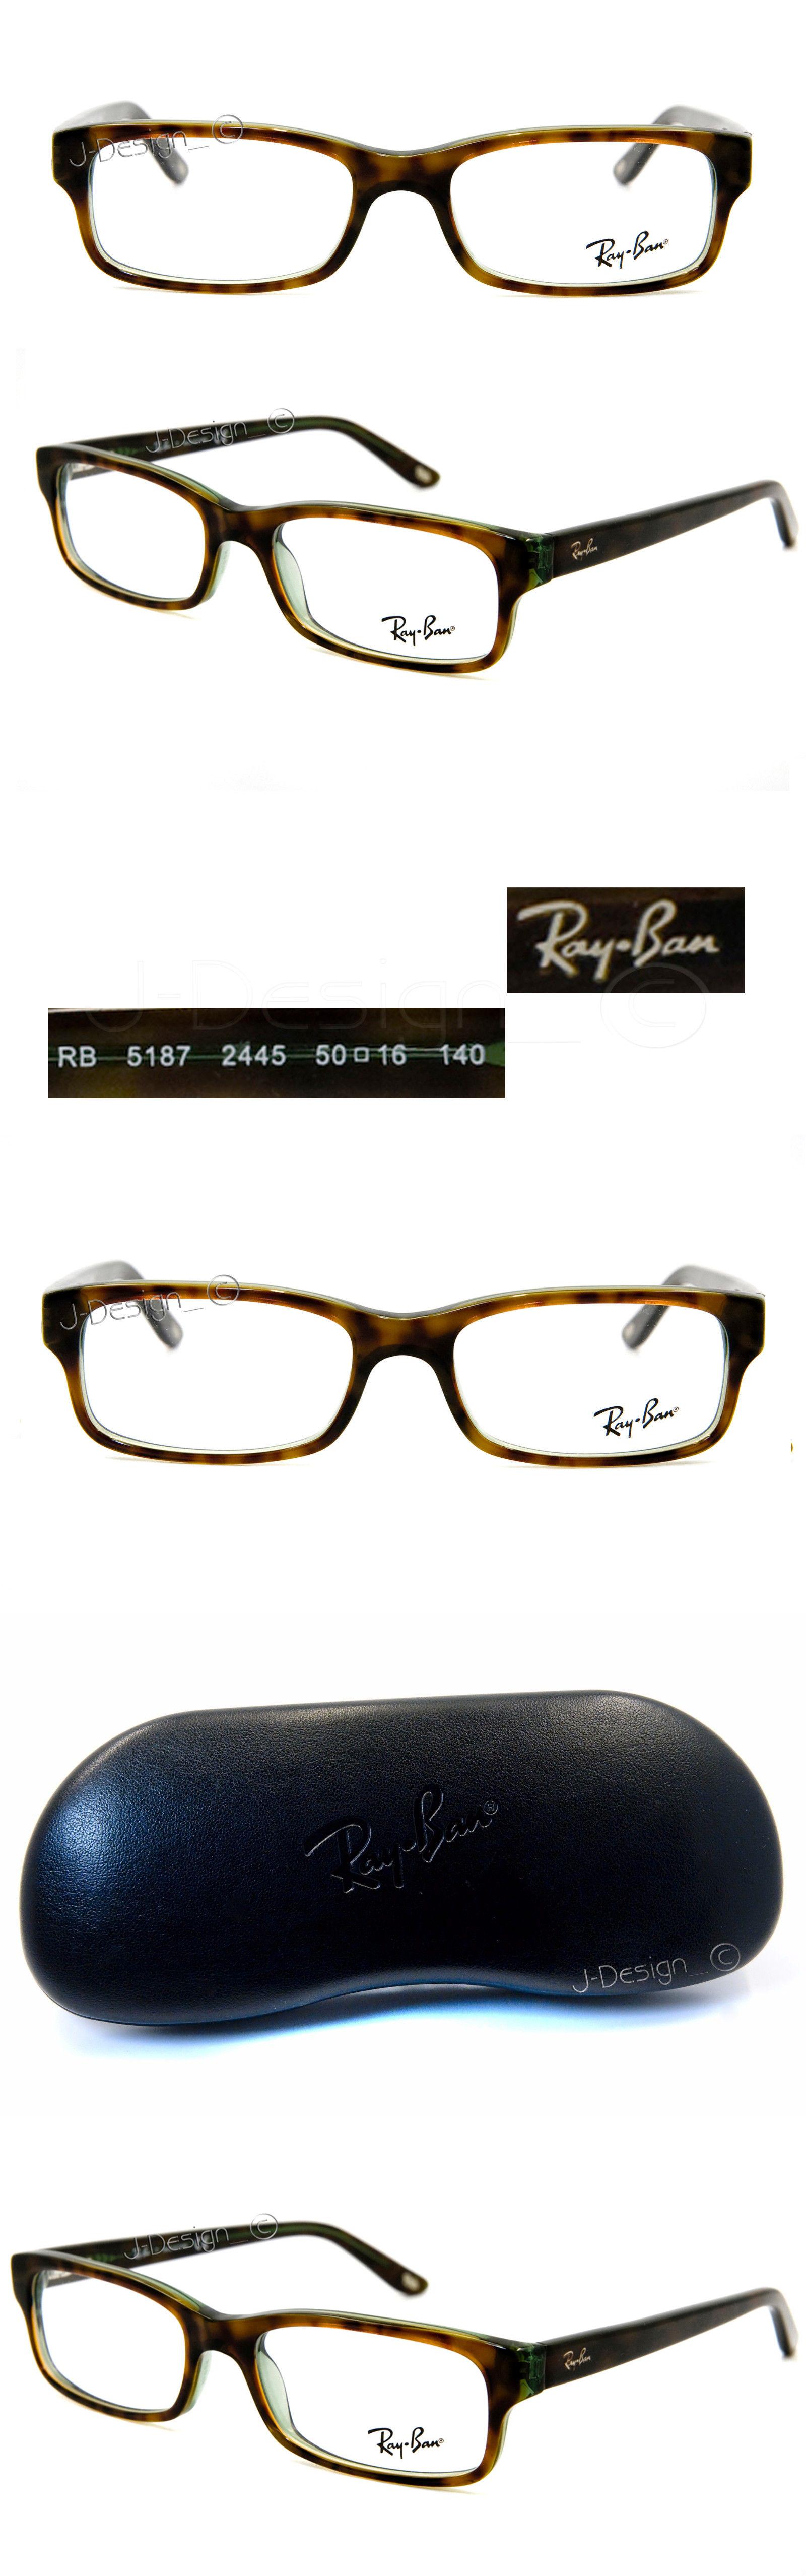 e6d60b94da Eyeglass Frames  Ray Ban Rb 5187 2445 Havana On Green 50 16 140 Eyeglasses  Rx Made Italy - New -  BUY IT NOW ONLY   95.88 on eBay!